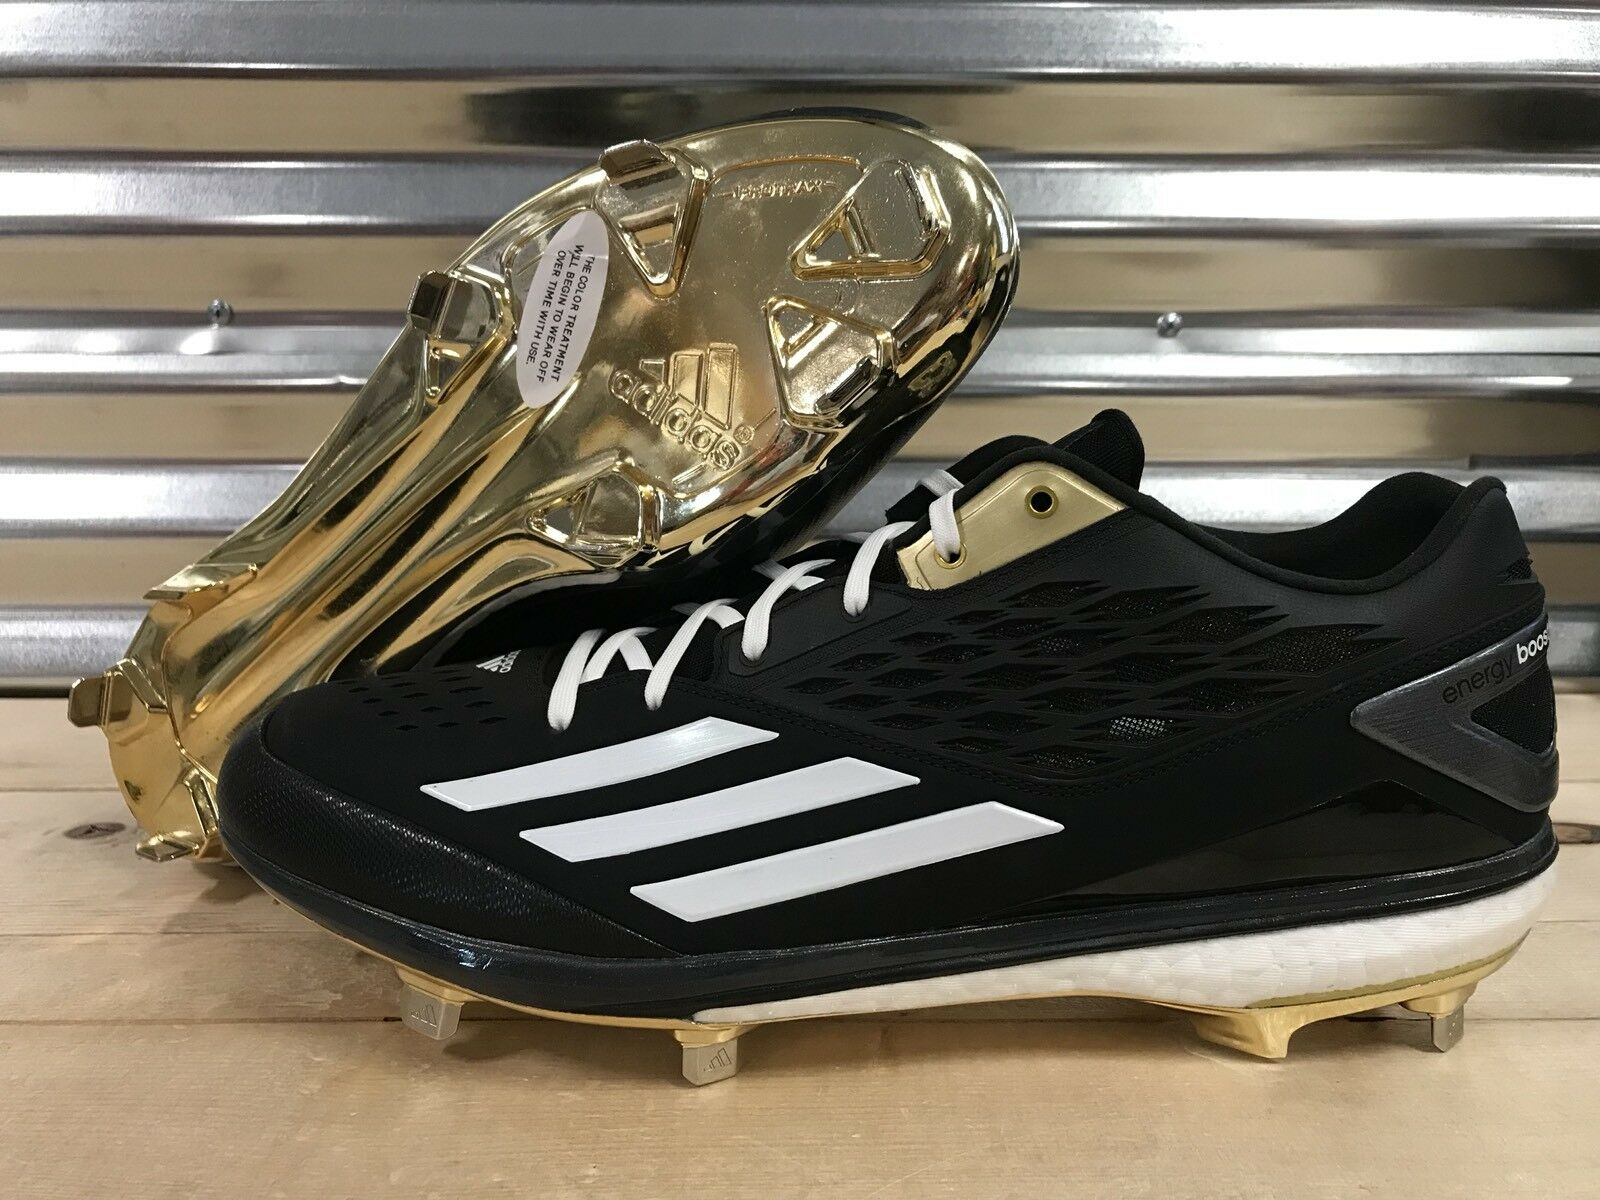 Adidas energia impulso icona james baseball shields pe scarpe da baseball james sz 12,5 (aq8405) 7da43c